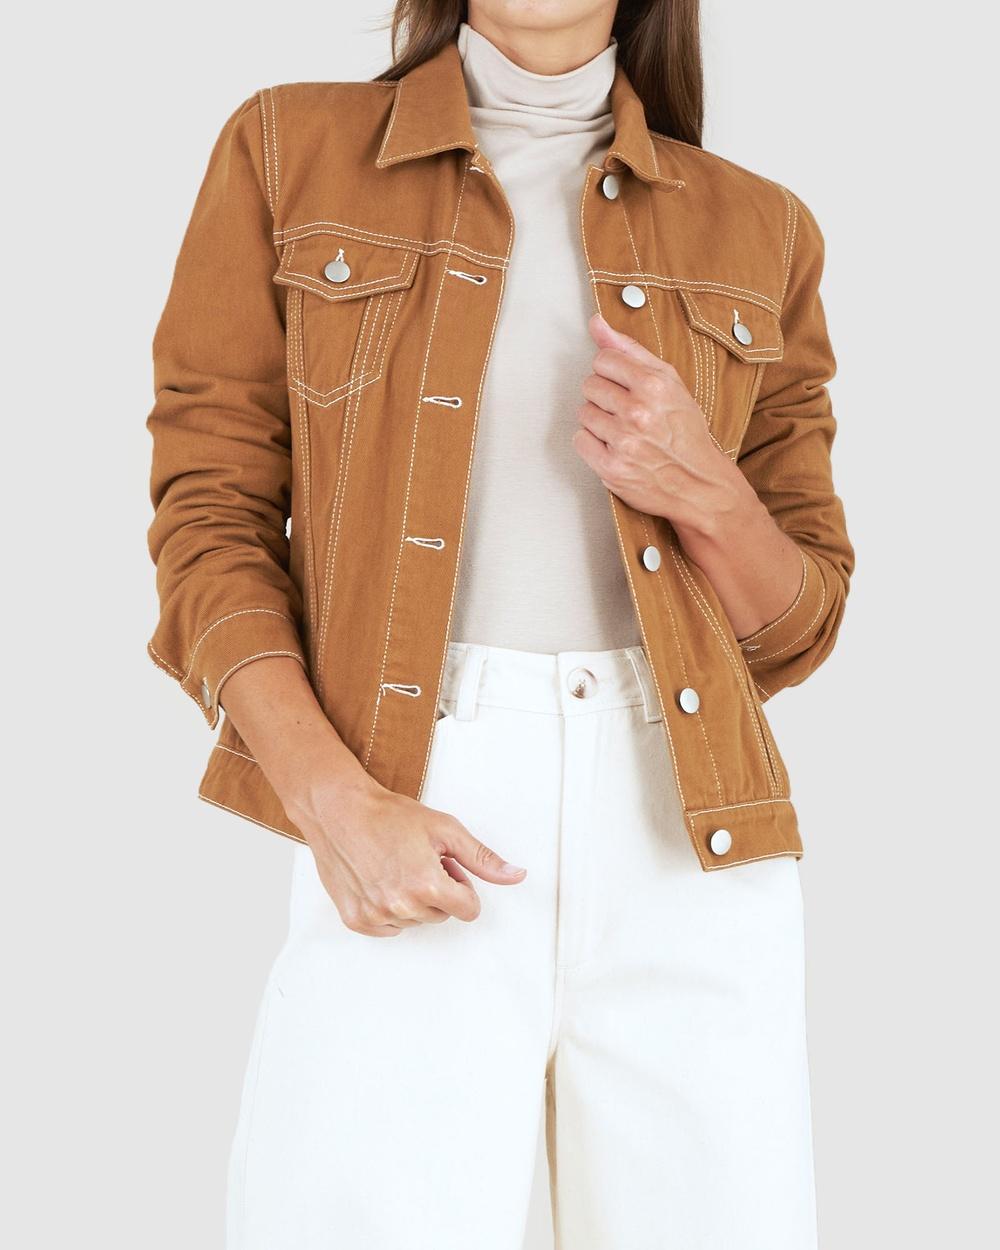 Amelius Alliance Drill Denim Jacket Coats & Jackets Brown Australia